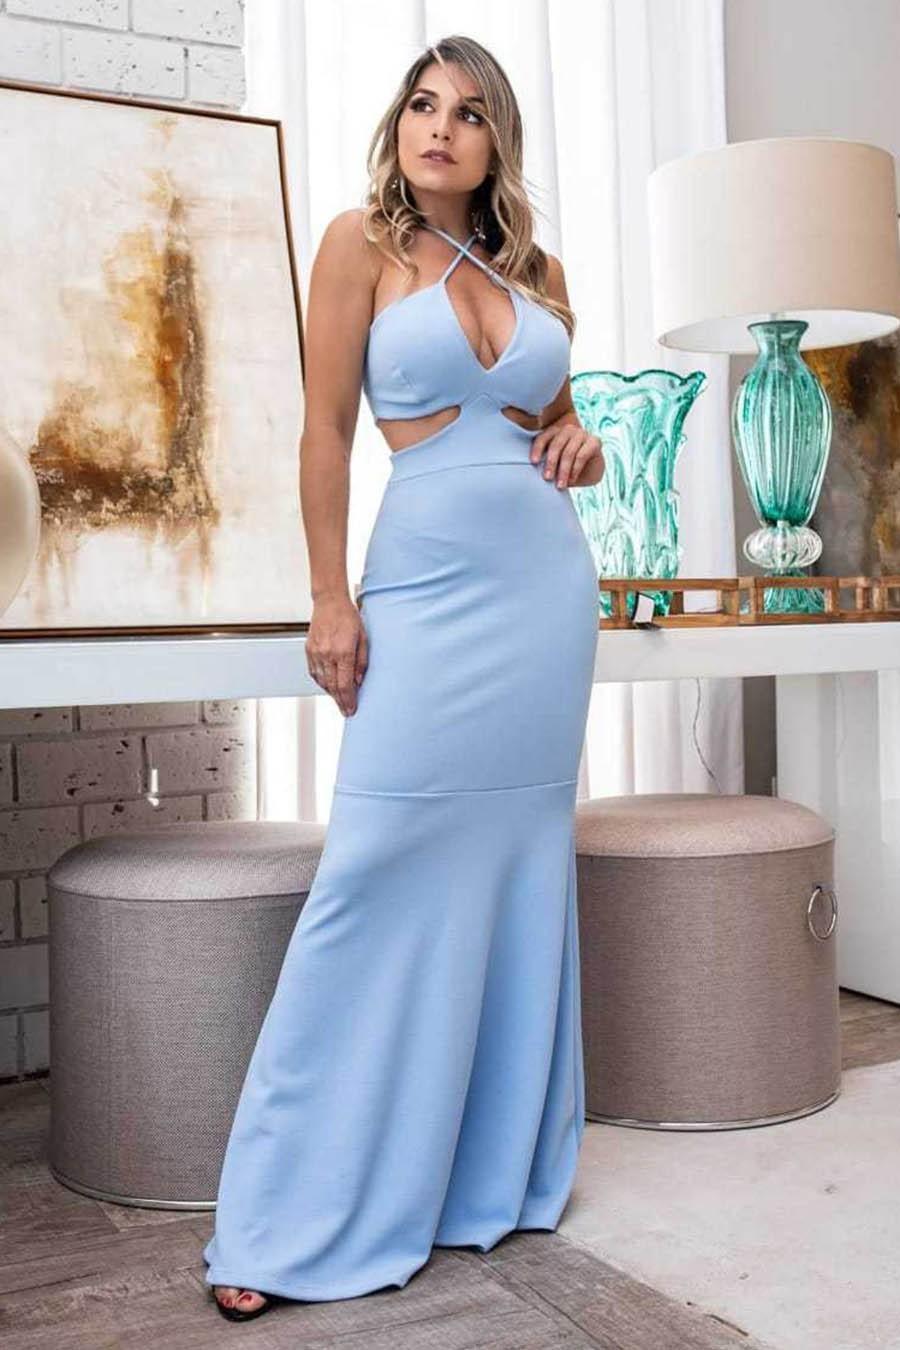 Vestido Longo Crepe Decotado Vazado Sereia Azul Claro